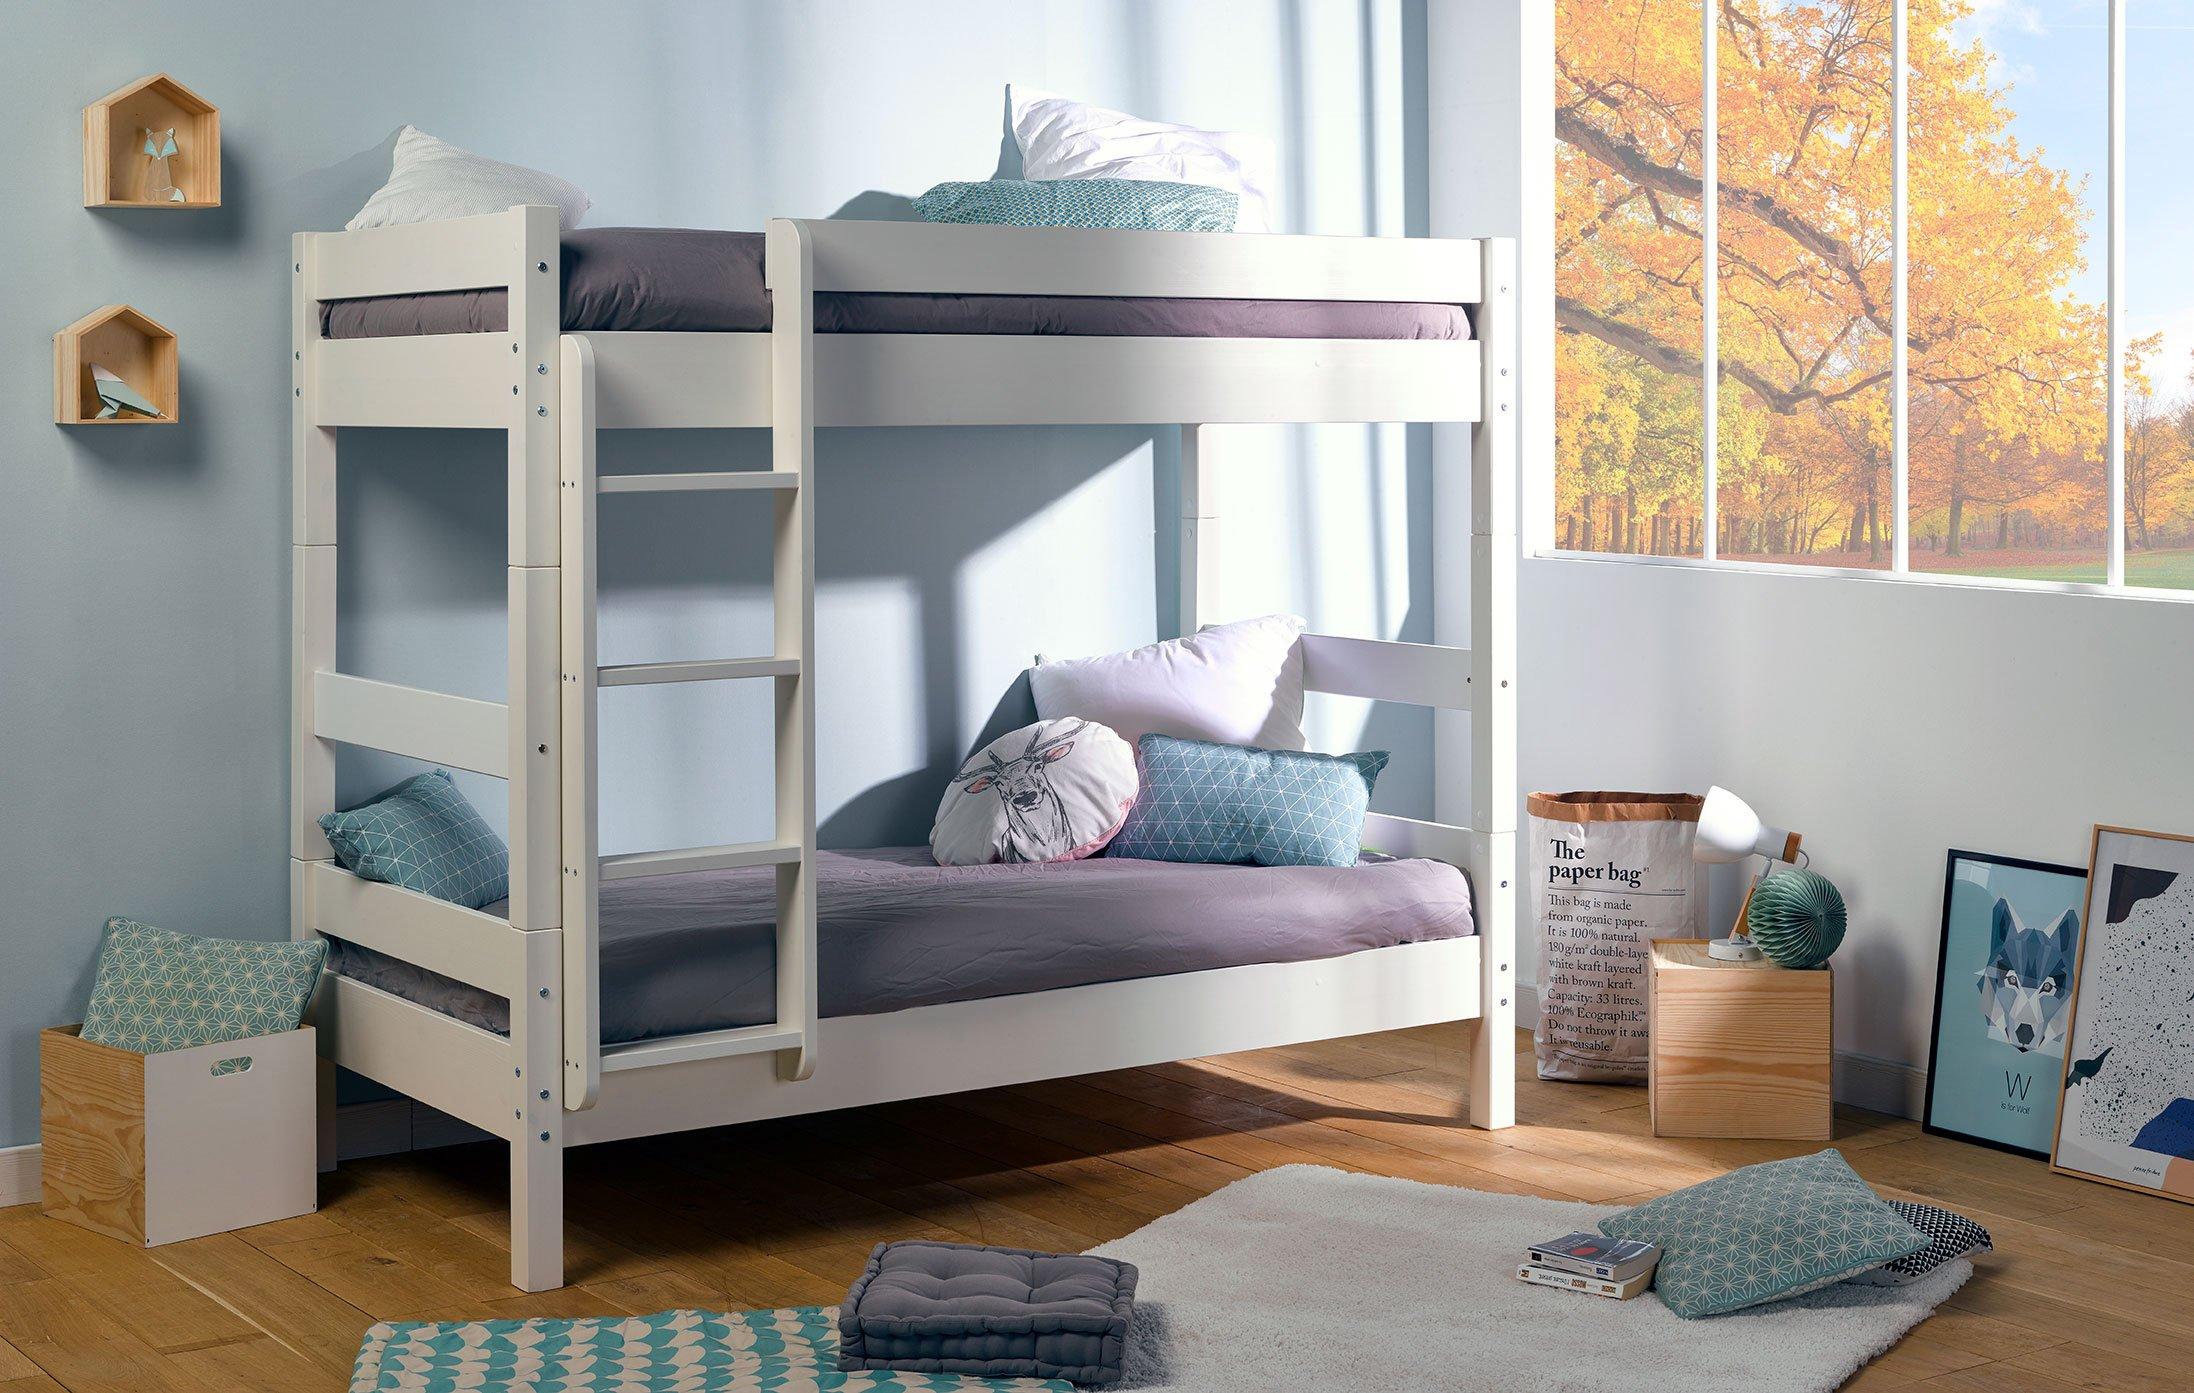 idkid 39 s lit superpos 80x190 bois massif blanc inspid co. Black Bedroom Furniture Sets. Home Design Ideas